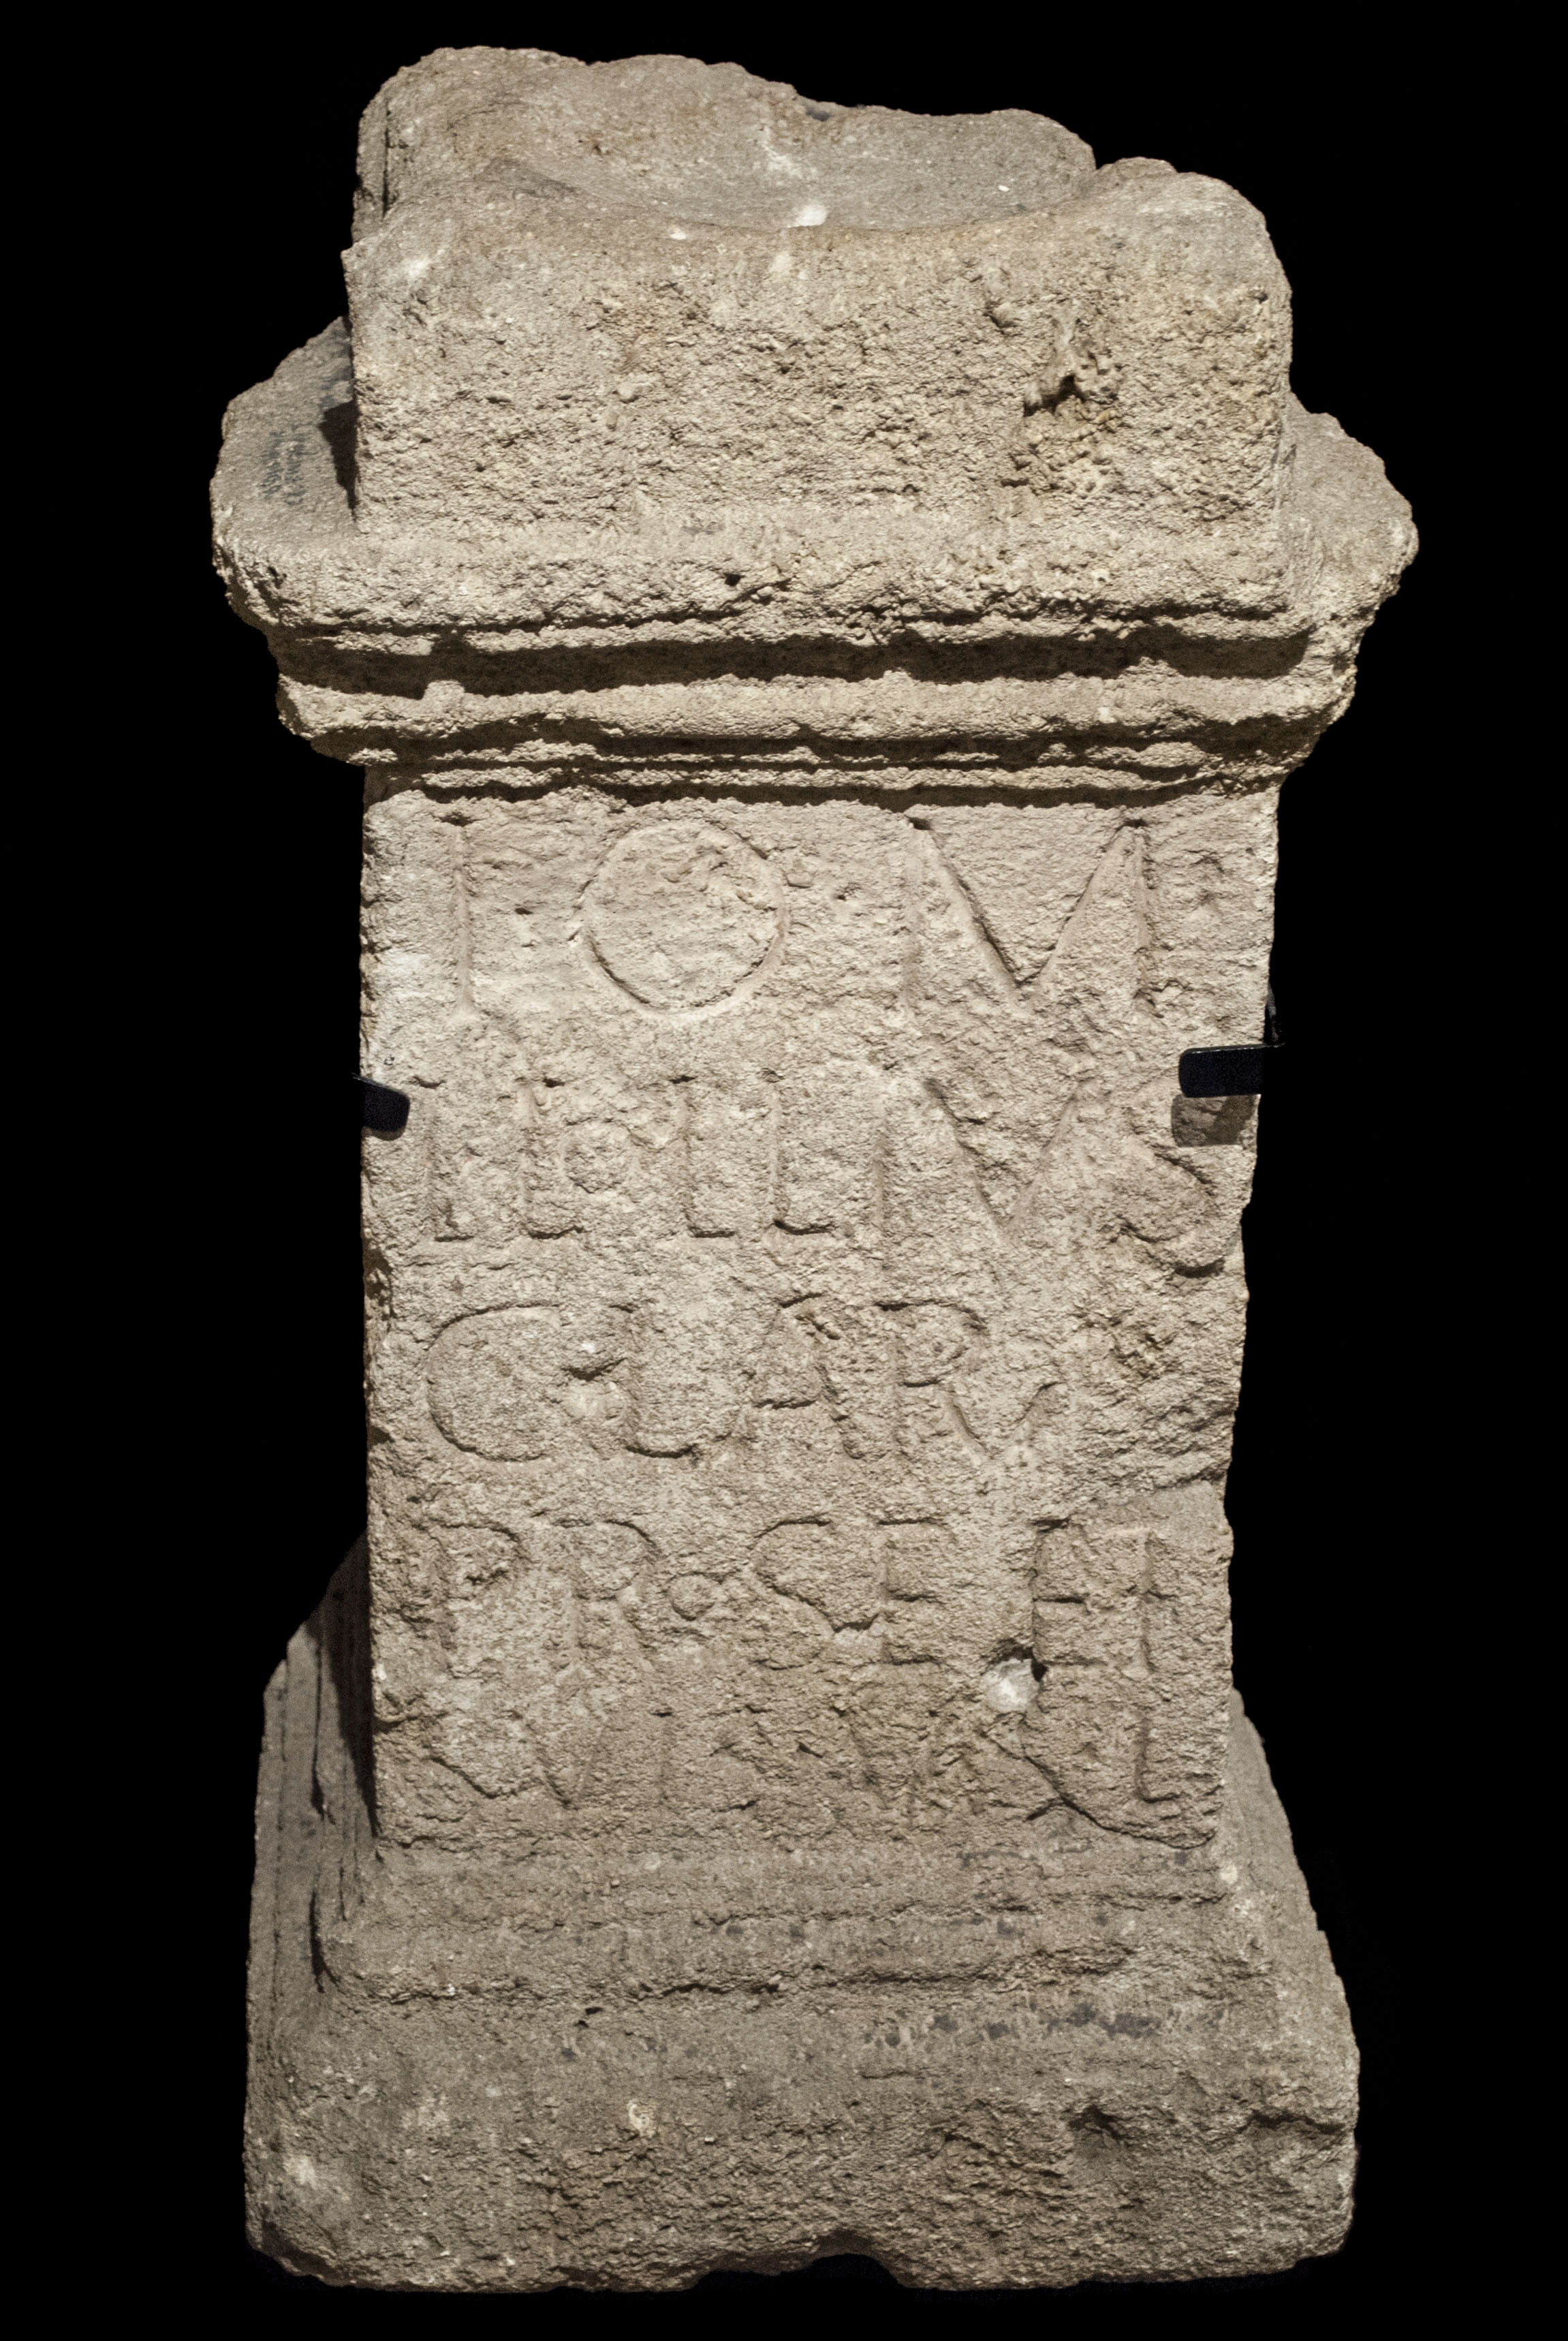 An image of an altar to Jupiter Optimus Maximus.